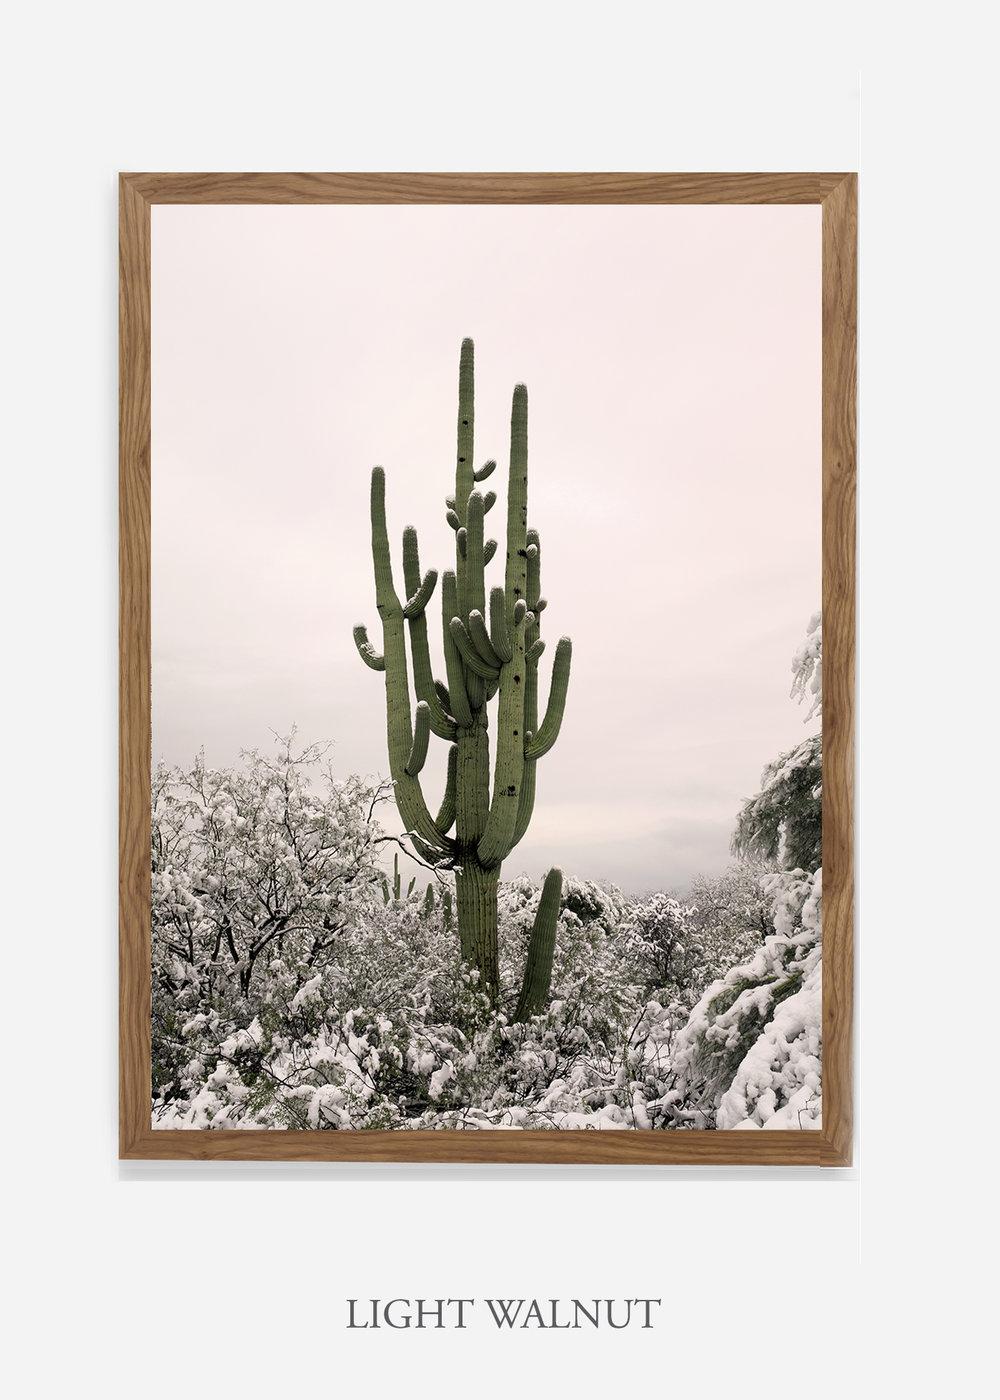 nomat-lightwalnutframe-saguaroNo.8-wildercalifornia-art-wallart-cactusprint-homedecor-prints-arizona-botanical-artwork-interiordesign.jpg